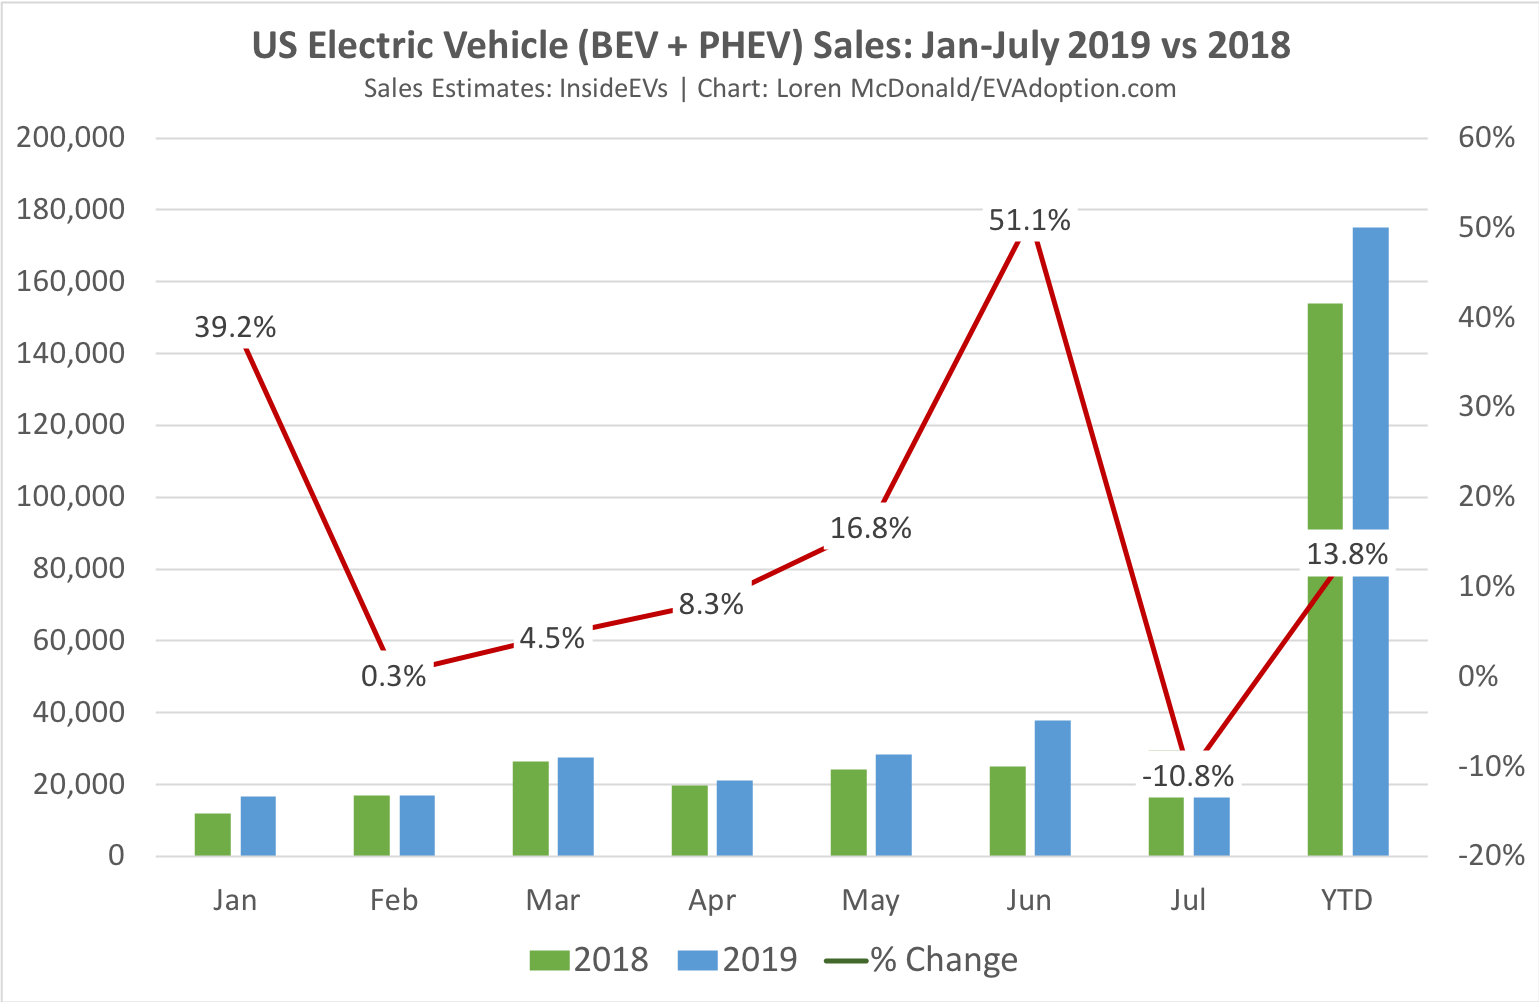 US EV Sales Down 11% for July, Up 14% YTD